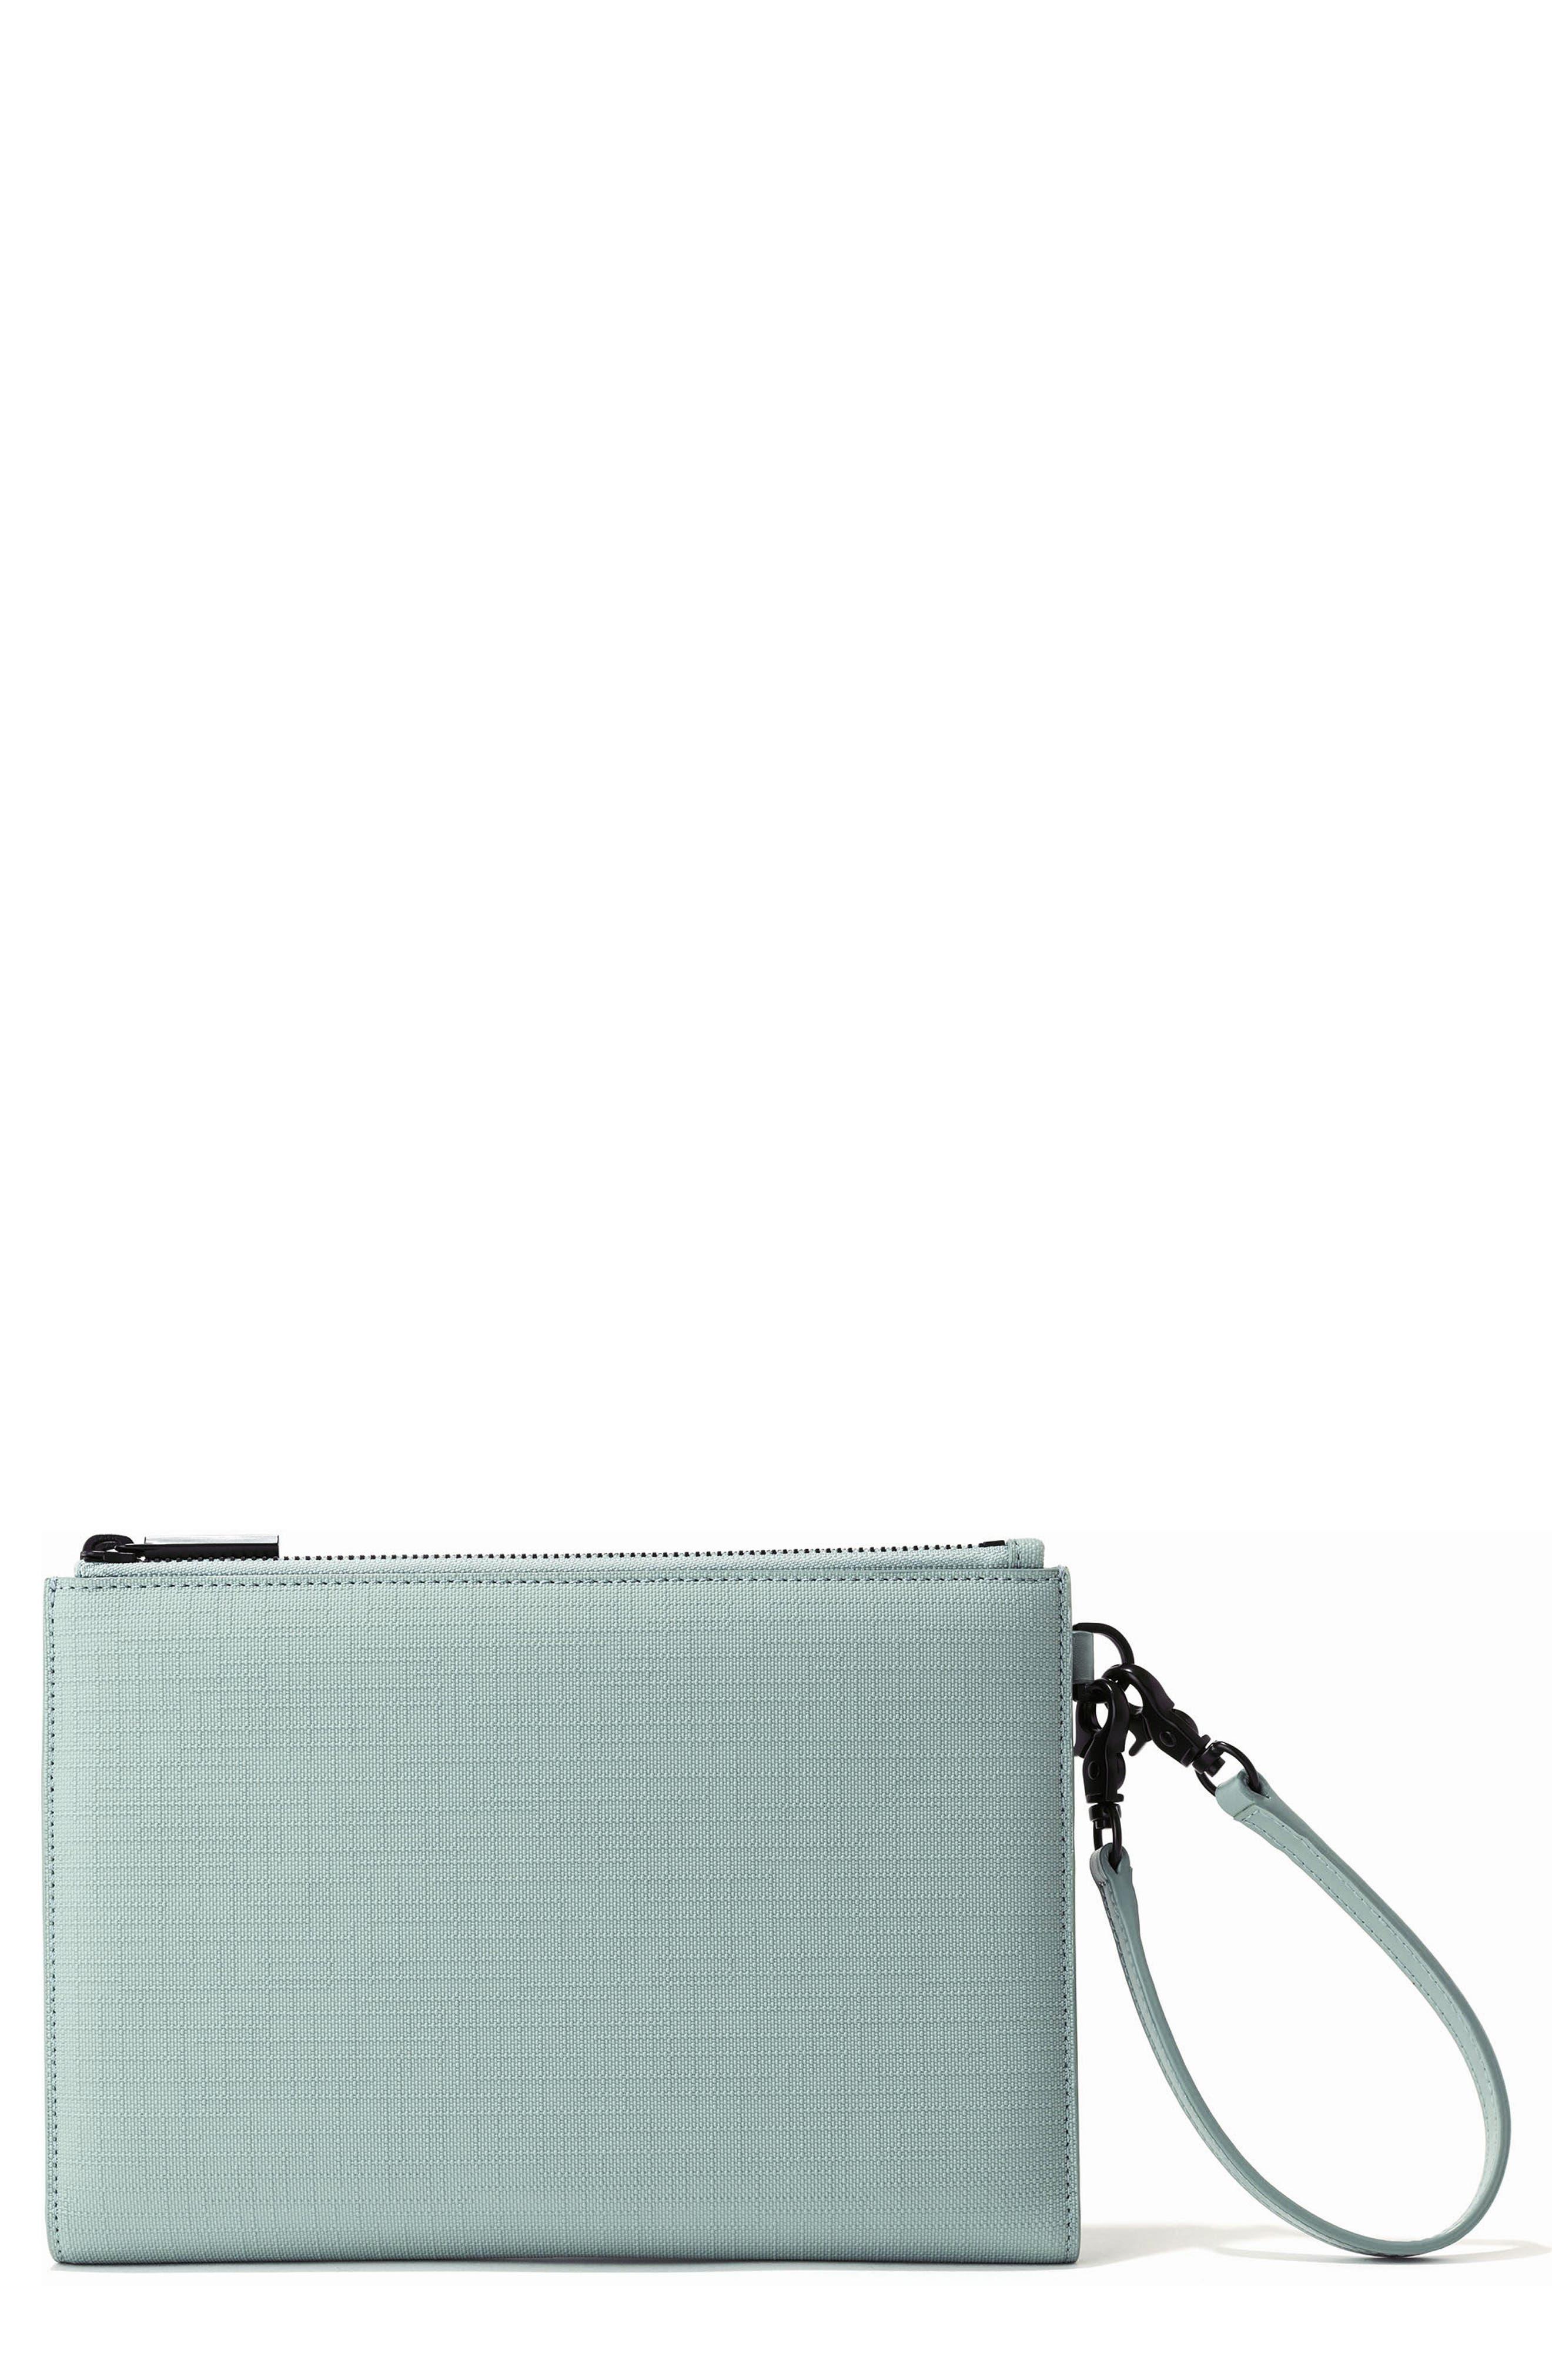 DAGNE DOVER Signature Essentials Coated Canvas Clutch/Wallet, Main, color, SEA MIST